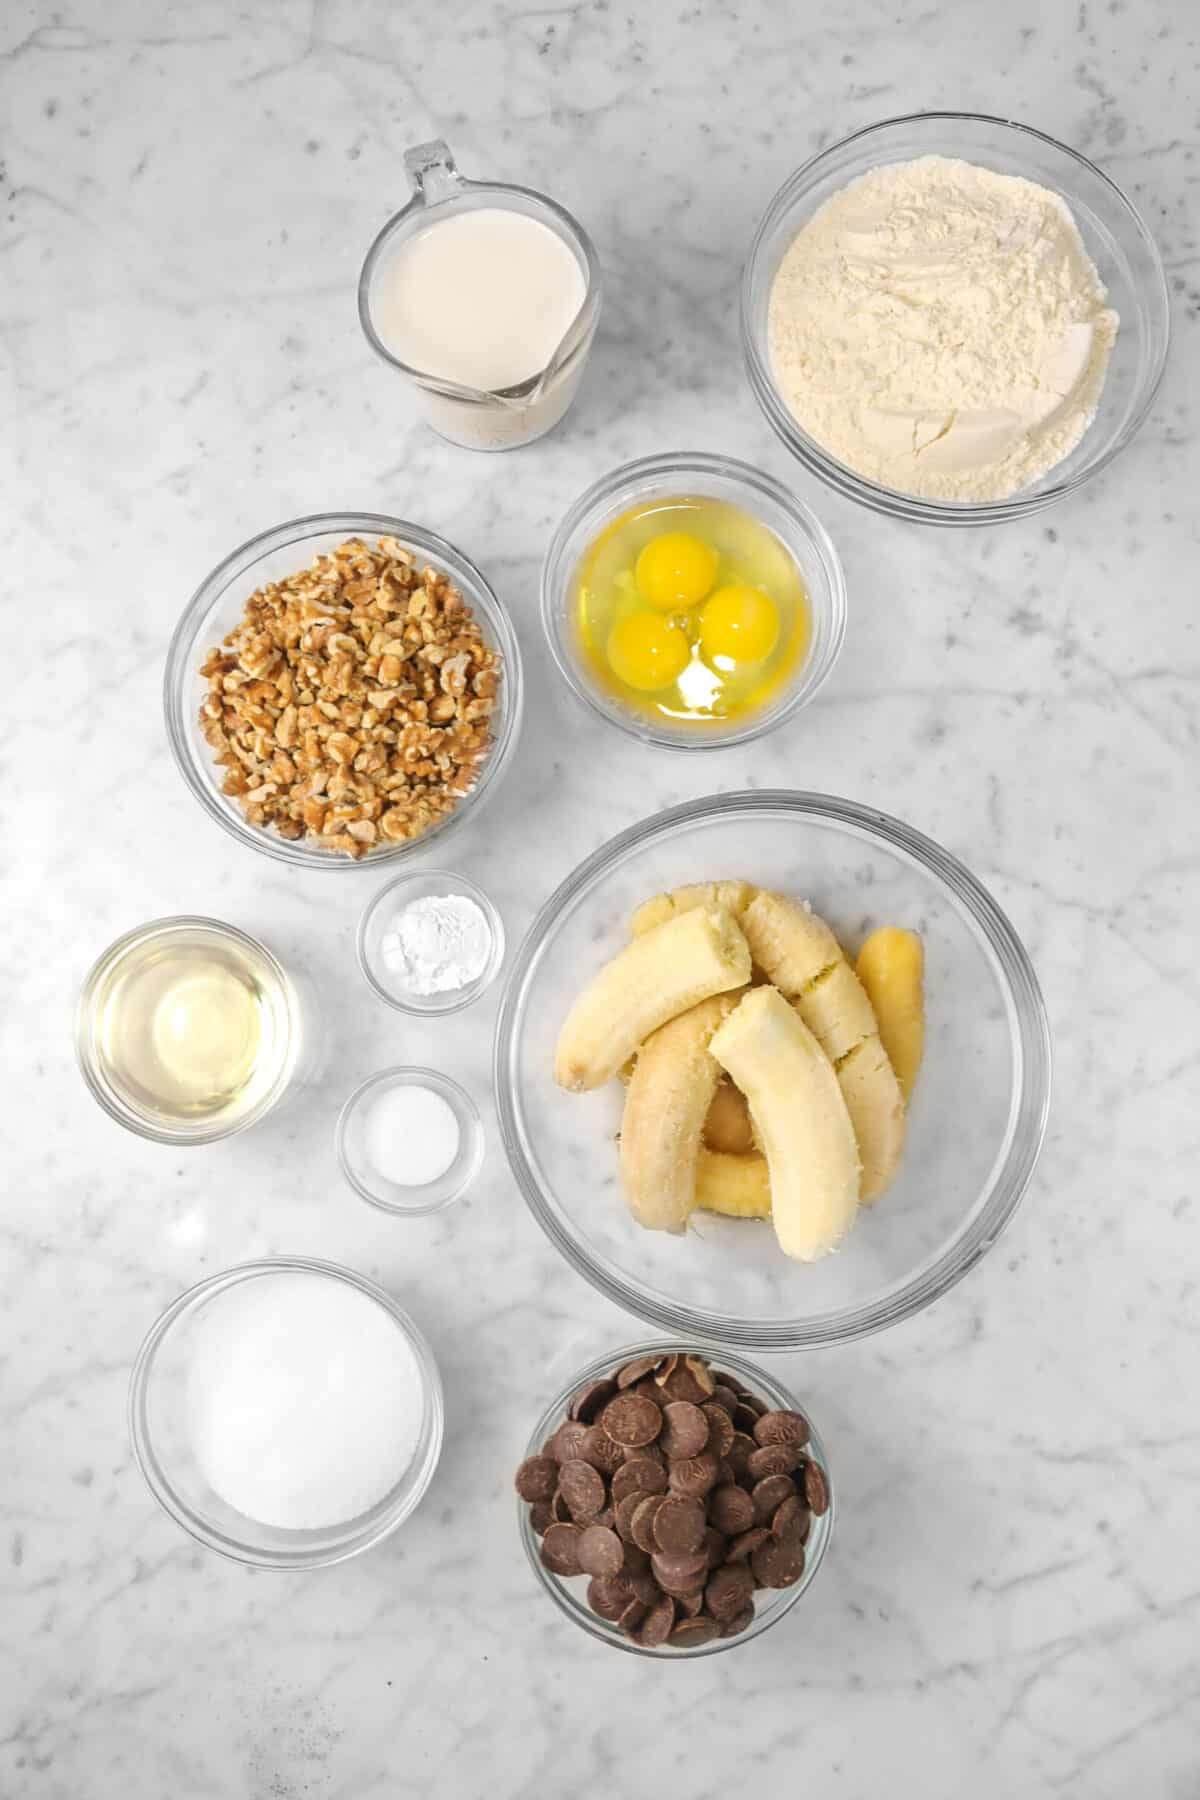 flour, eggs, bananas, chocolate, sugar, salt, baking powder, oil, walnuts, and milk in glass bowls